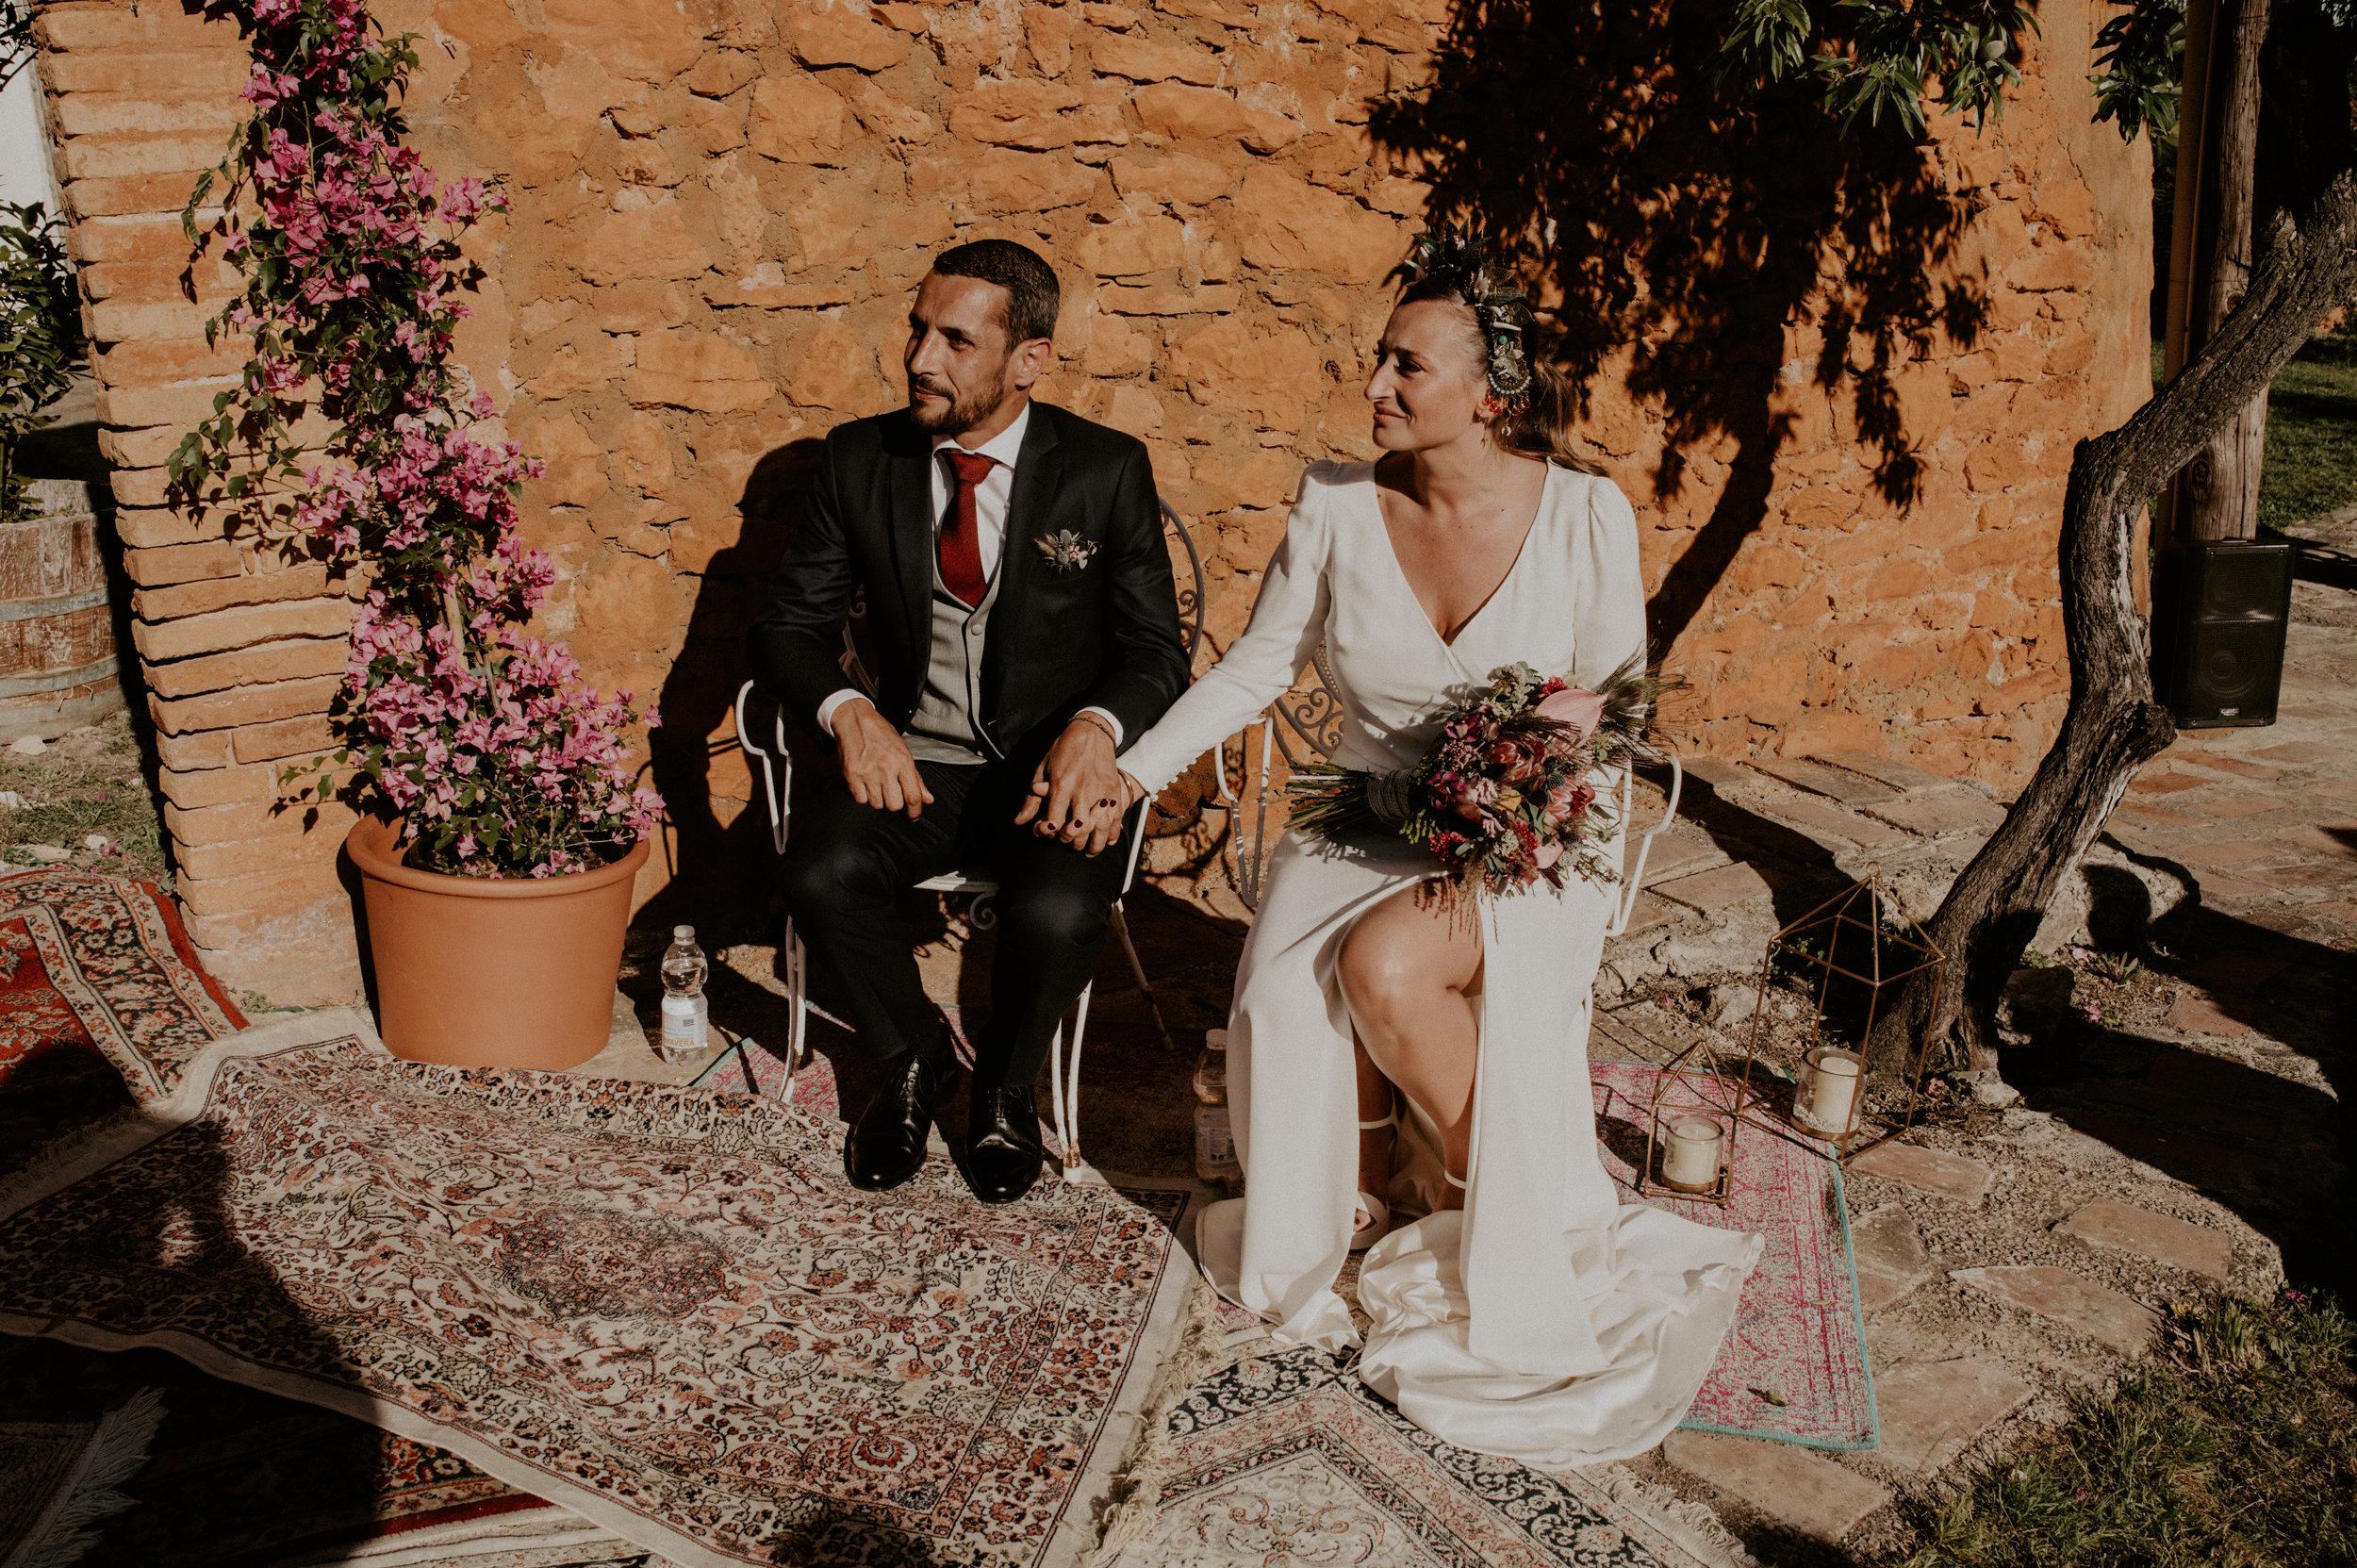 thenortherngirlphotography-fotografa-de-bodas-barcelona_destinartion-wedding-photographer_wedding-photographer_moroccan-wedding_HADNANANTIGONA-521.jpg